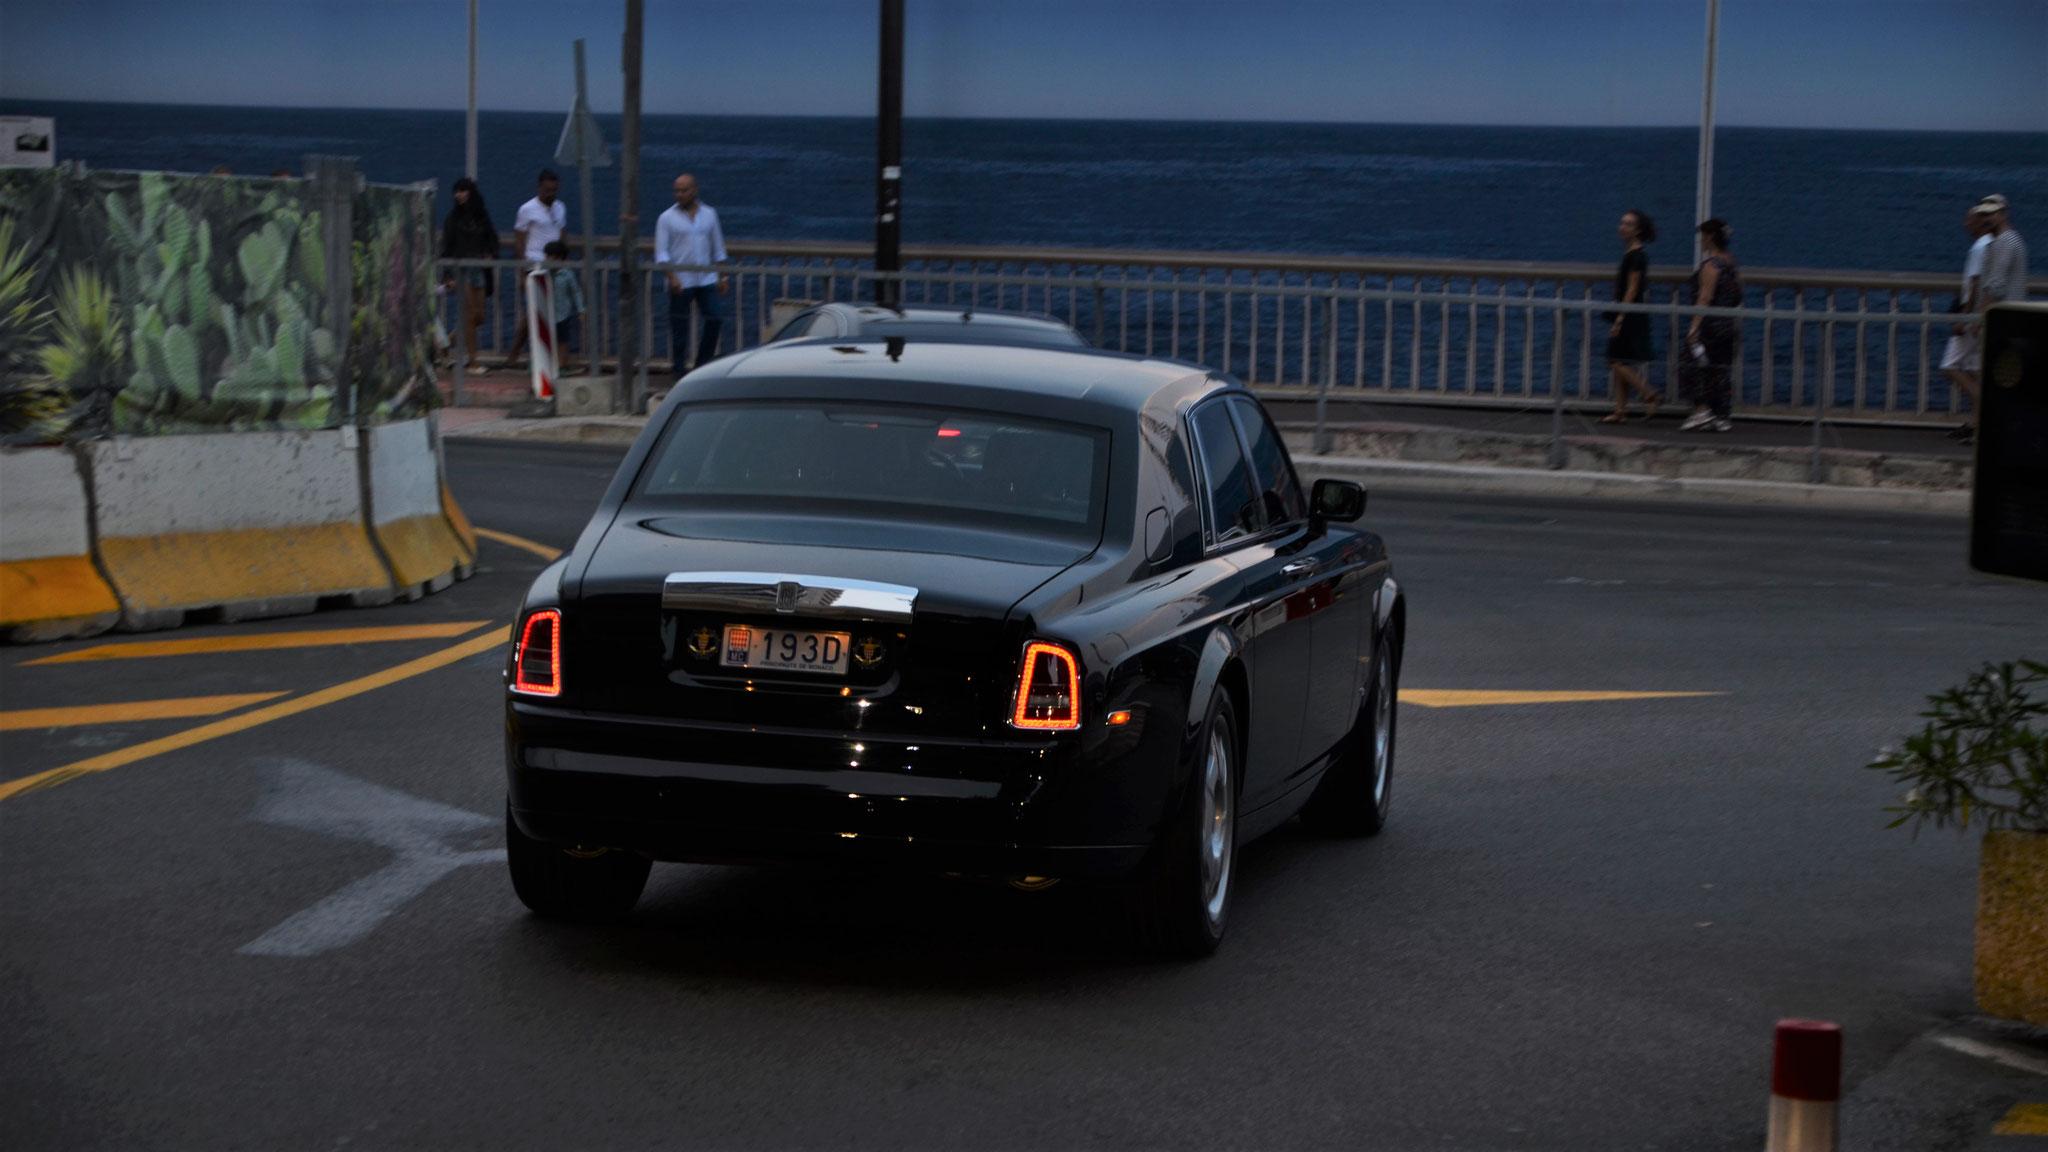 Rolls Royce Phantom - 193D (MC)